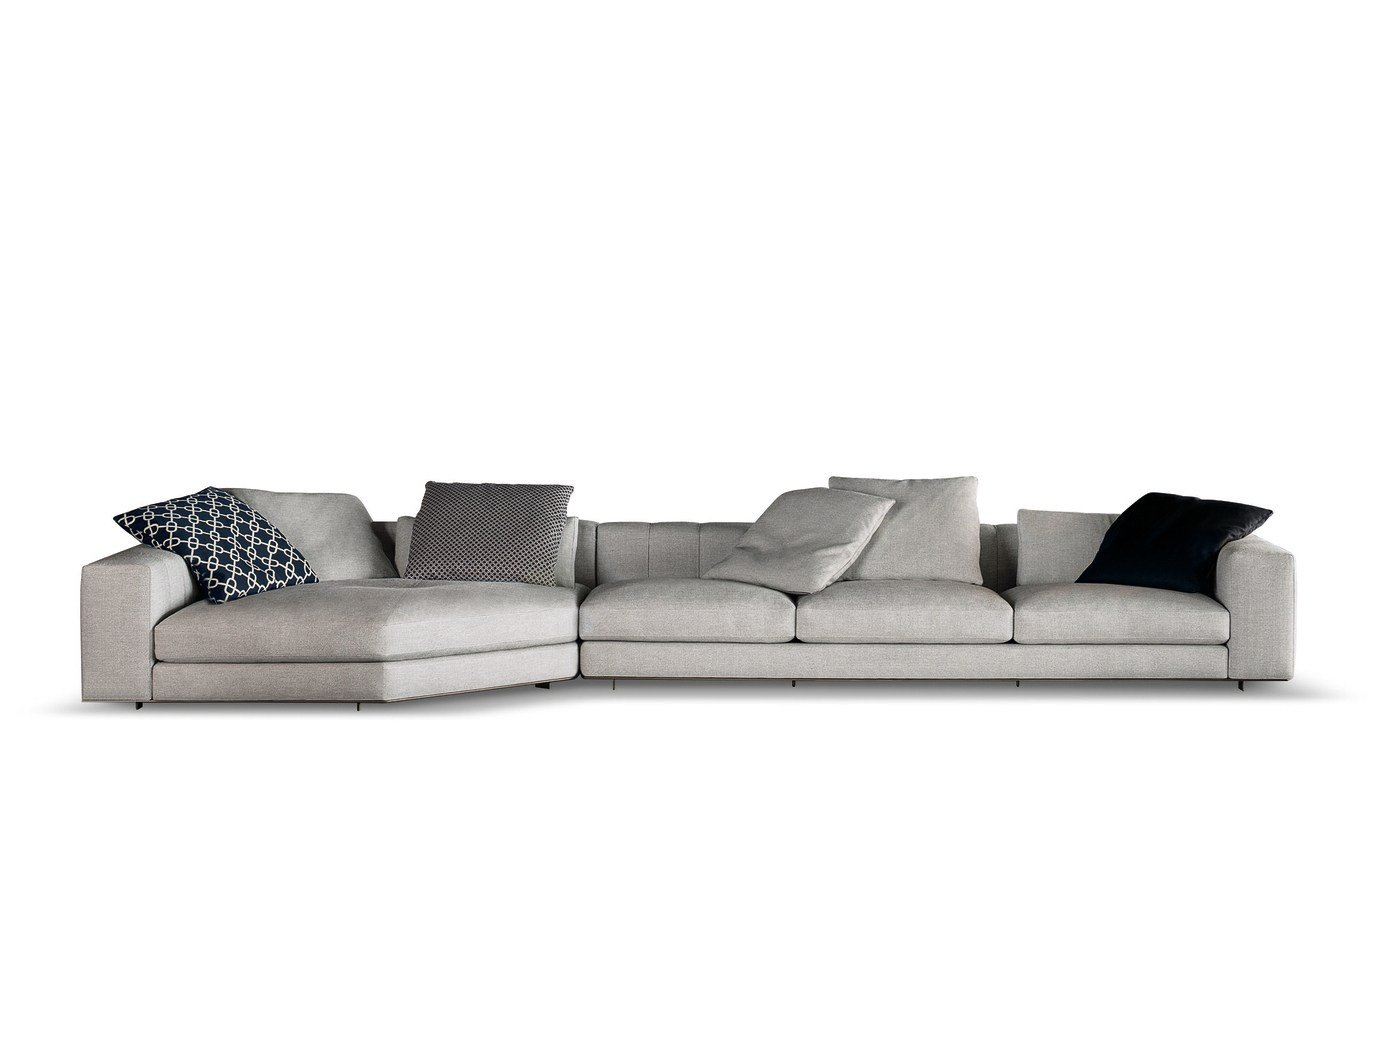 Sofa Freeman Duvet By Minotti Design Rodolfo Dordoni